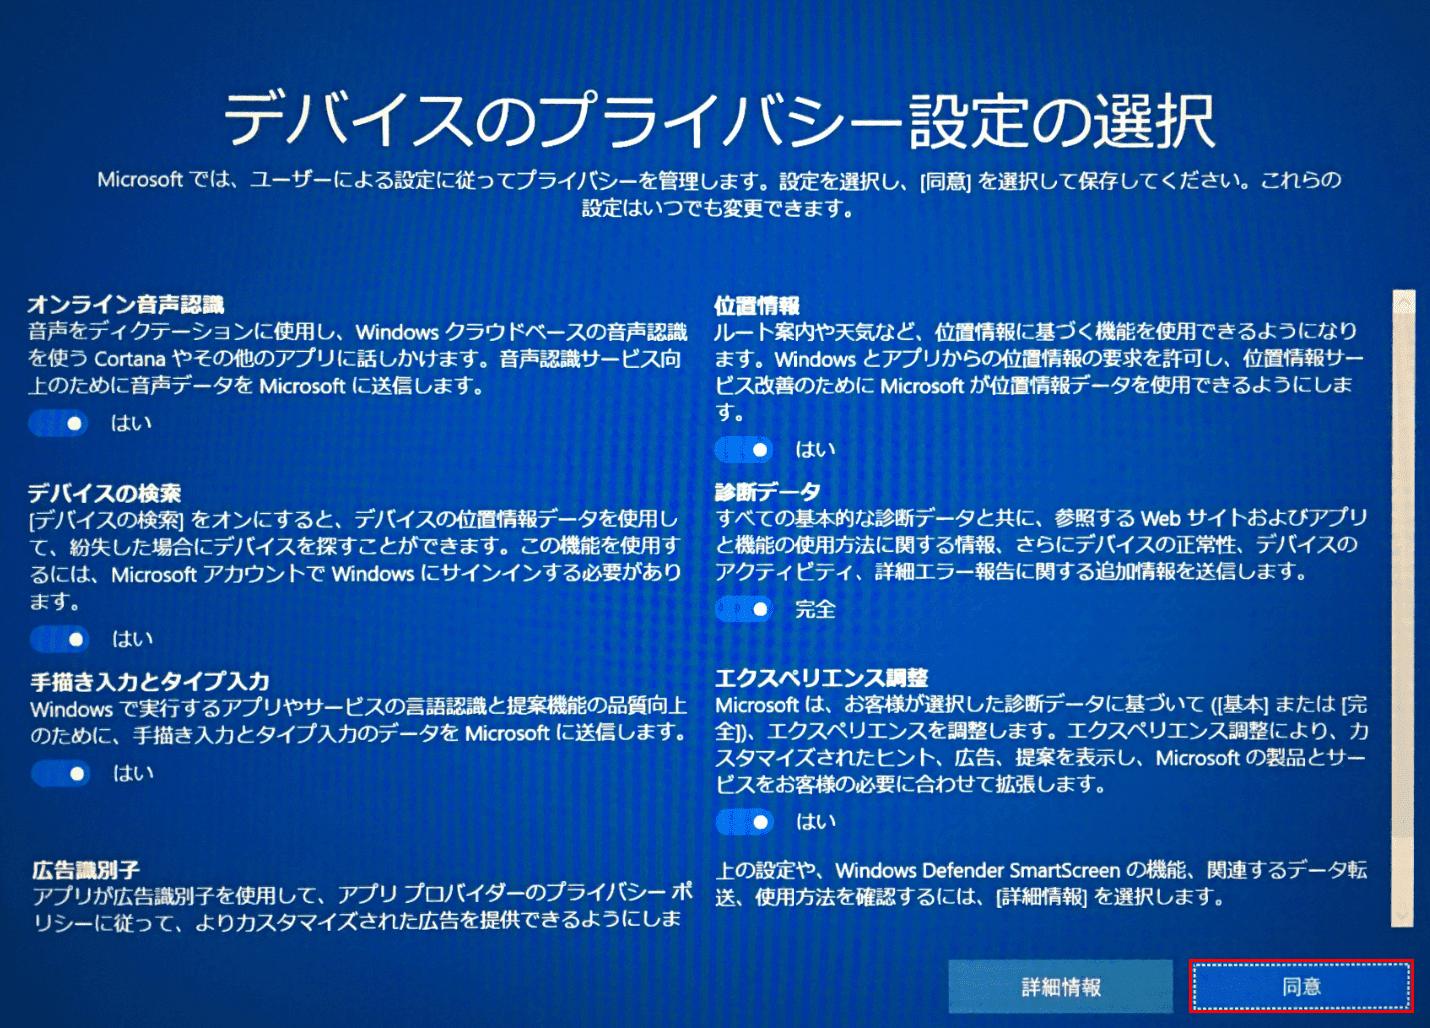 Windows10初期設定、プライバシー設定